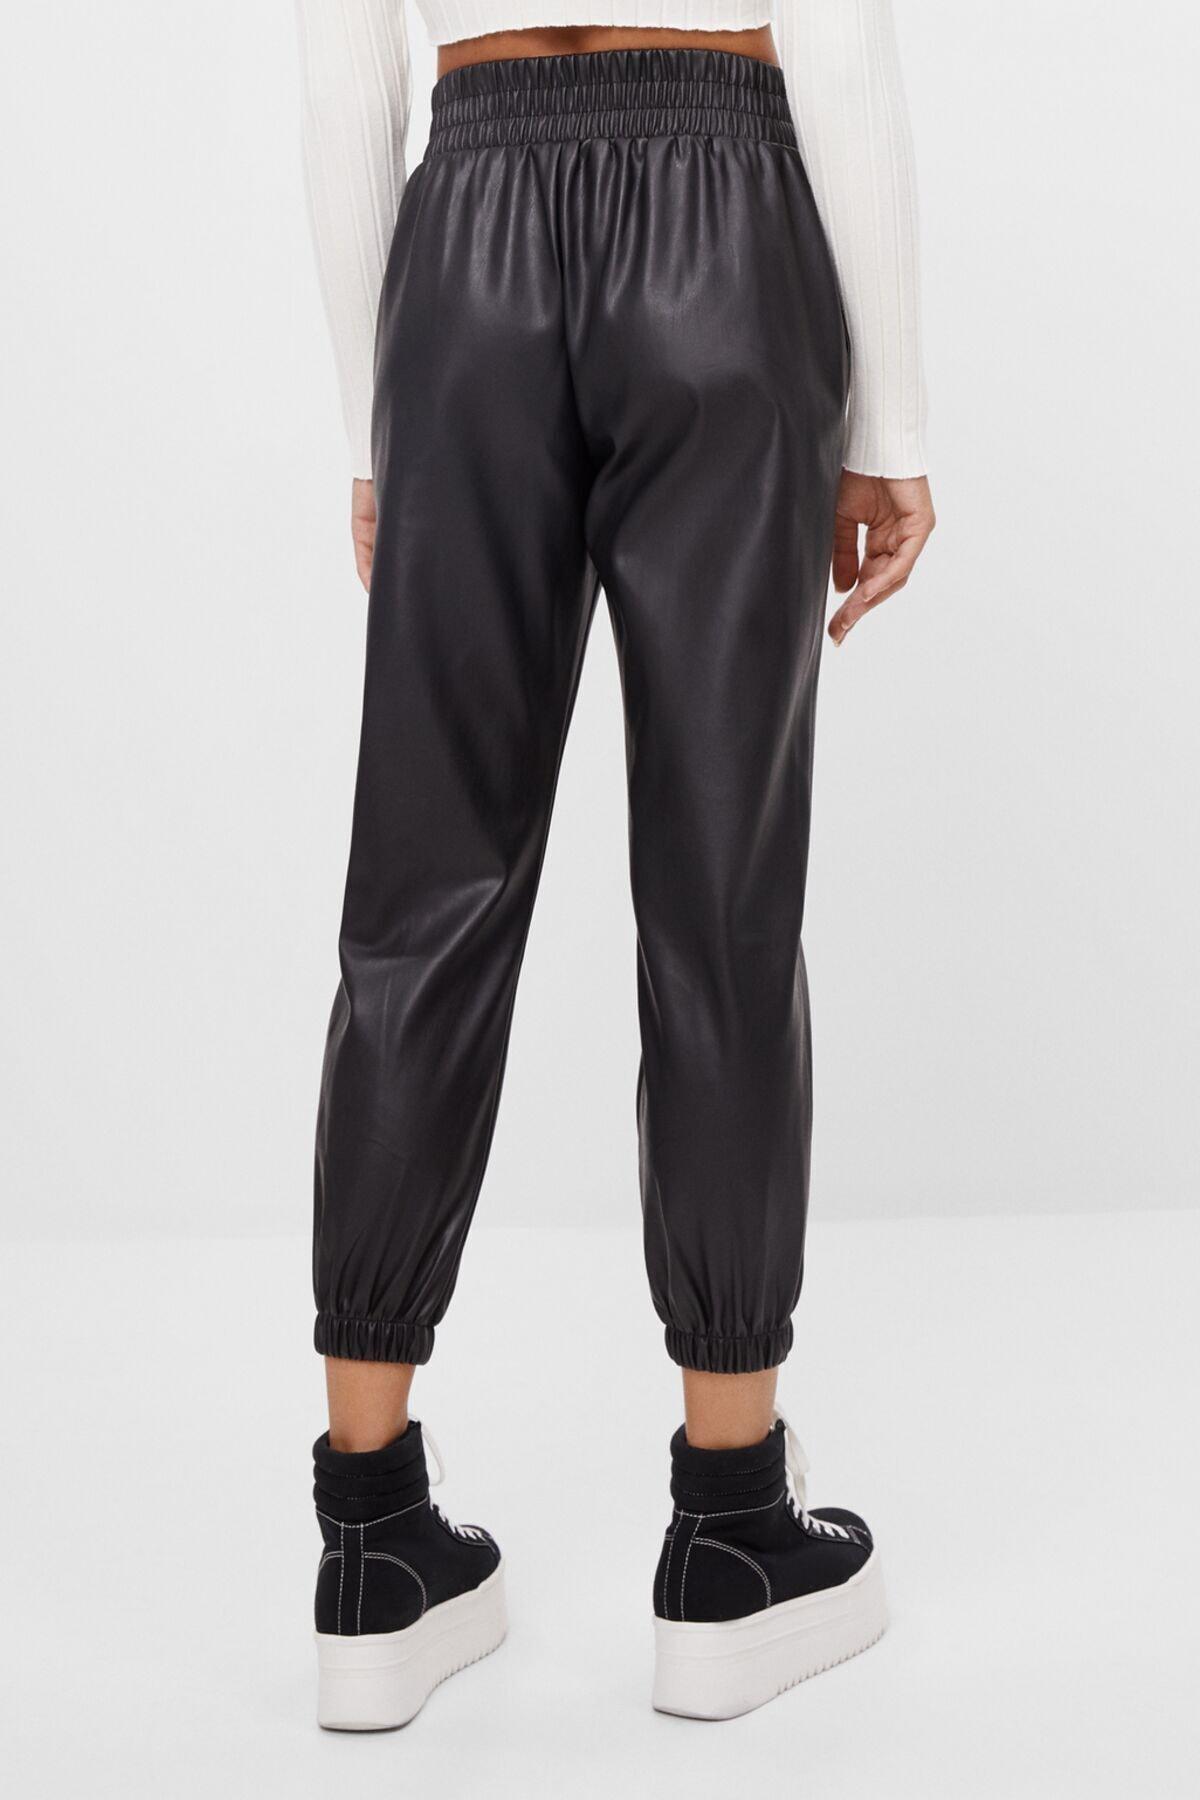 Bershka Kadın Siyah Deri Efektli Jogger Pantolon 2